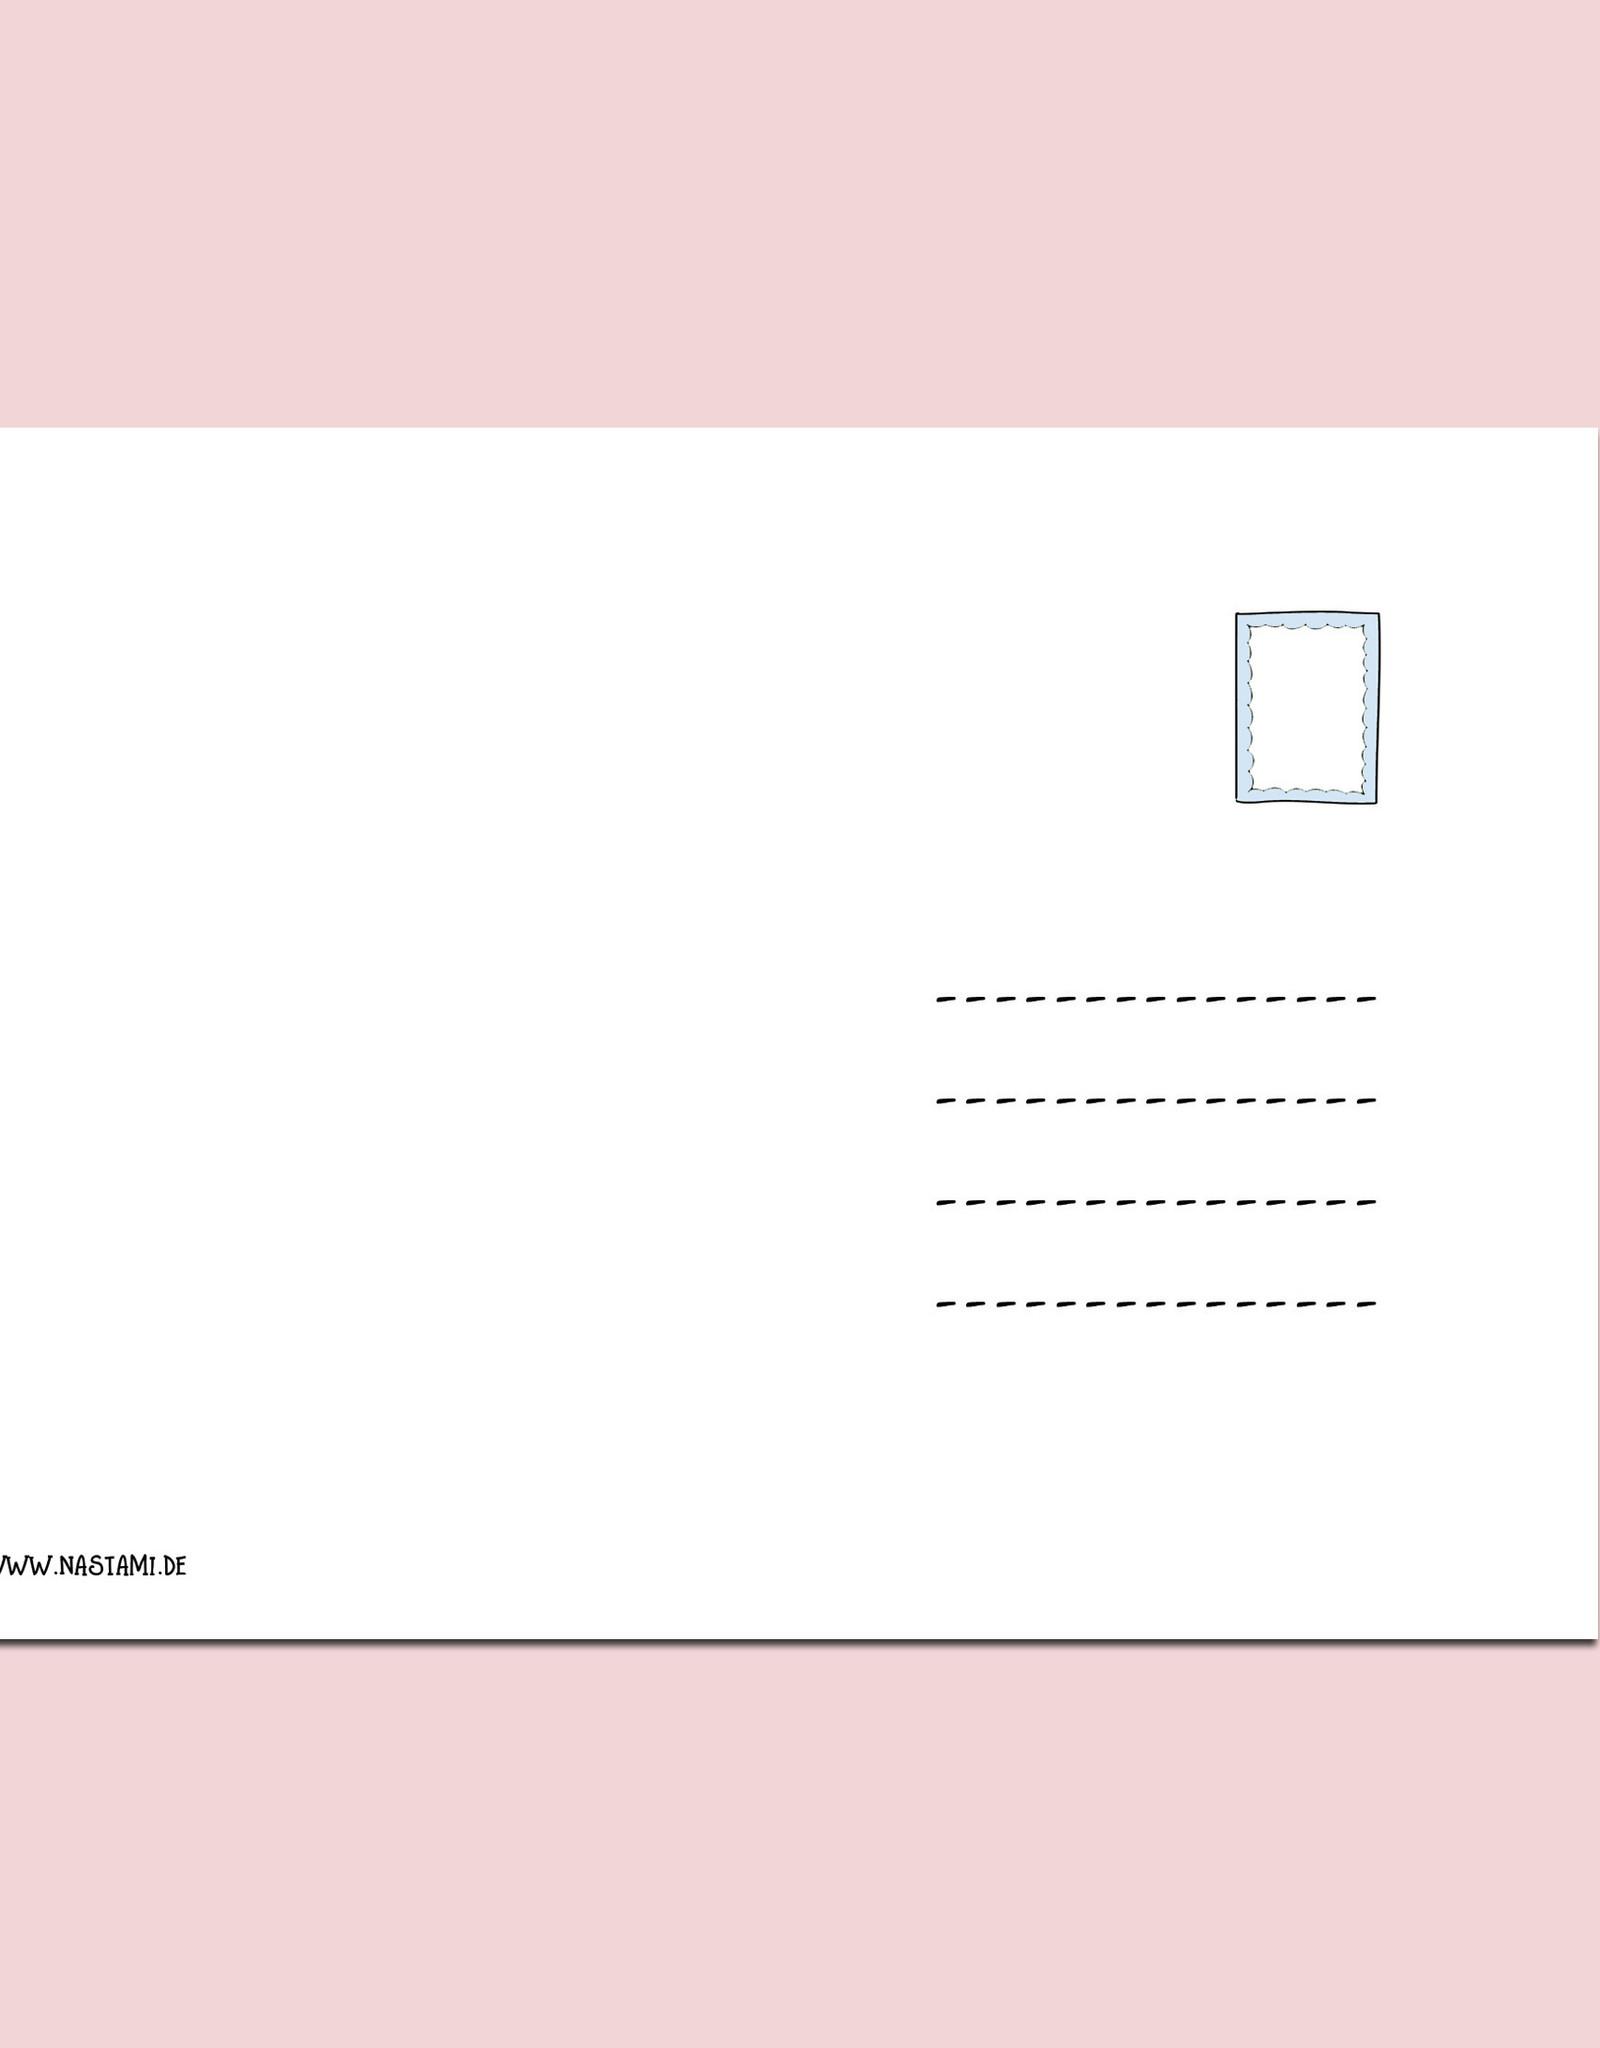 Postkarte Baby 1+1 Glückwunschkarte Geburt Grußkarte Baby